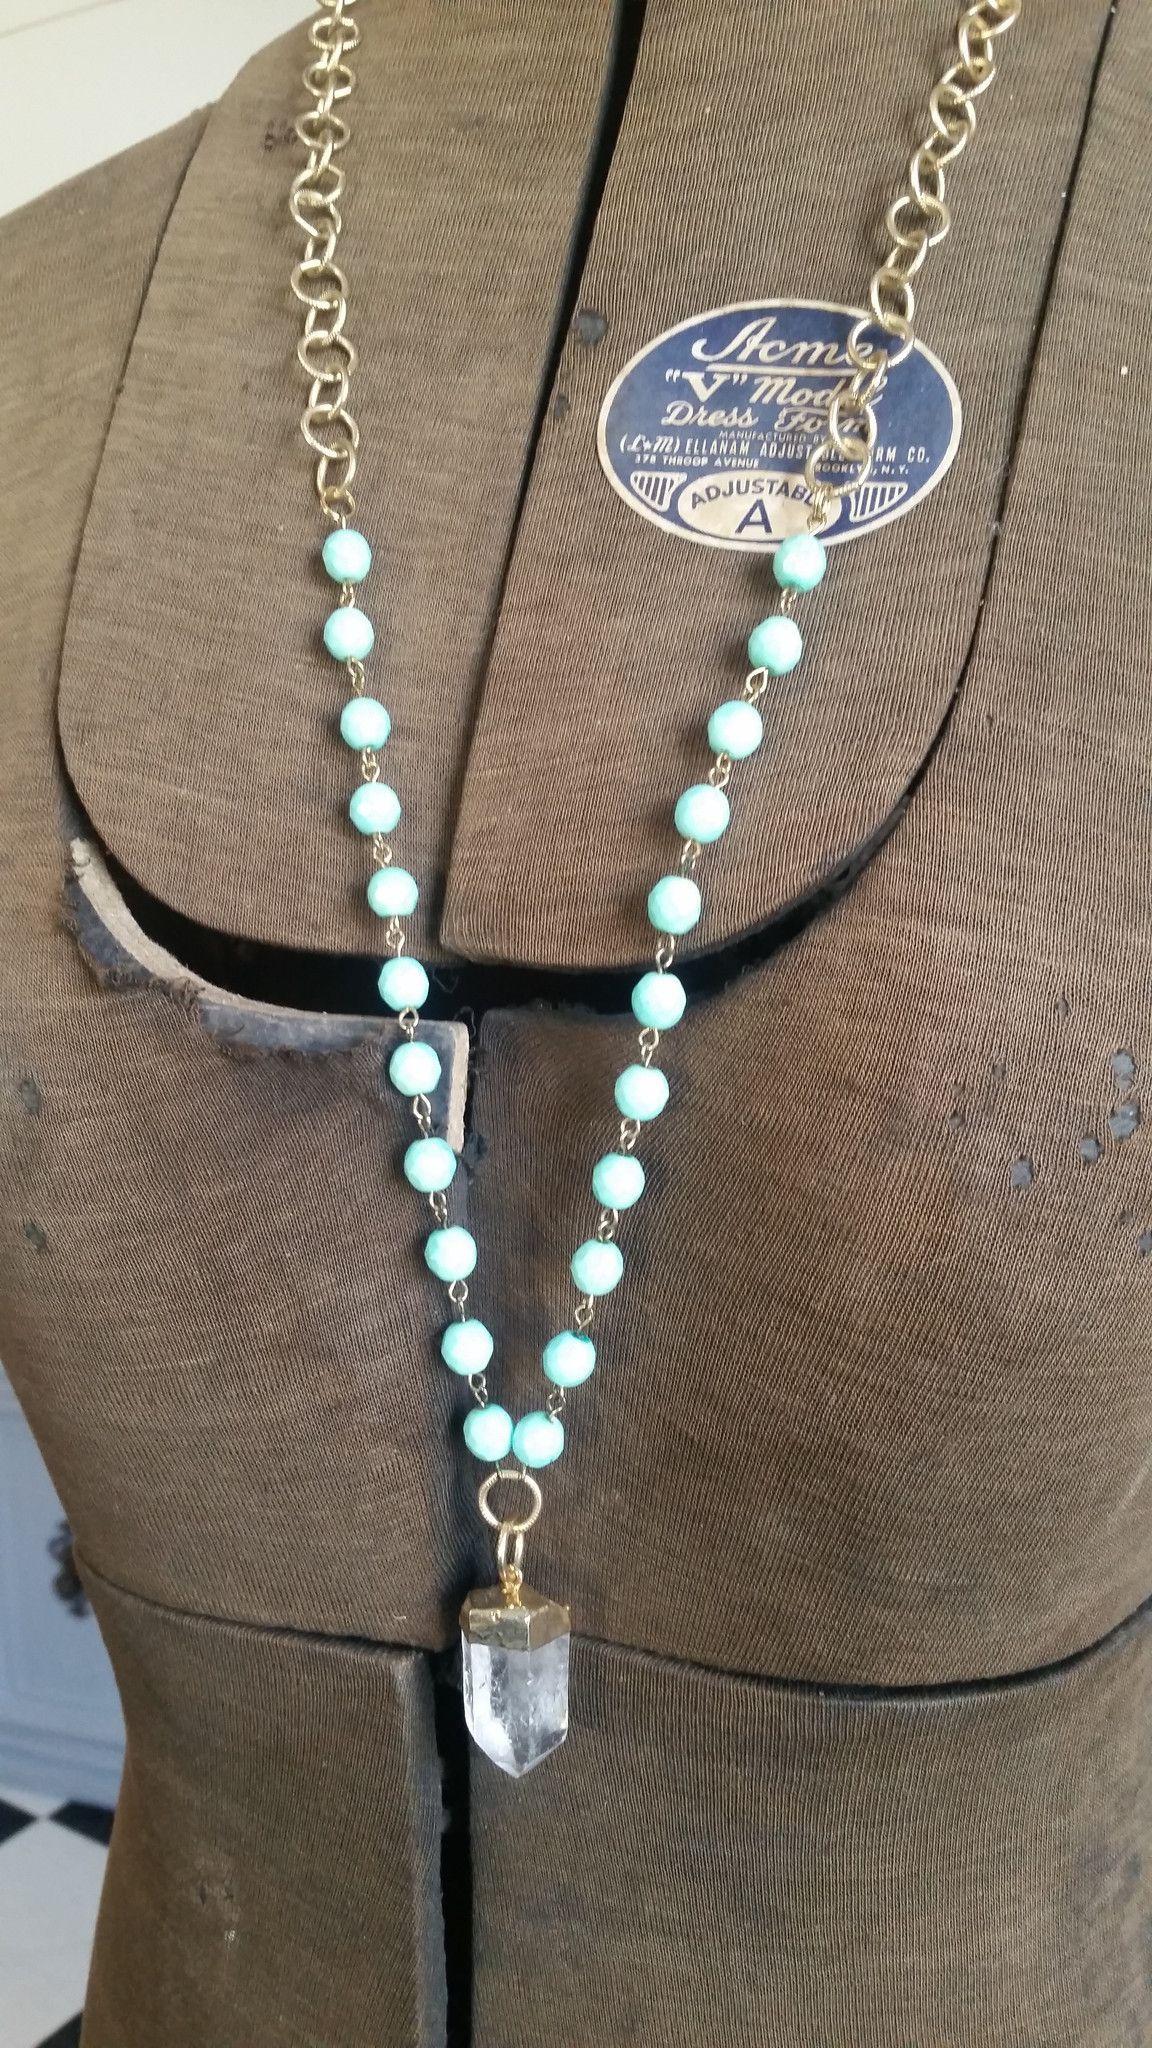 Anastasia Necklace with Crystal Beads/Raw Quartz